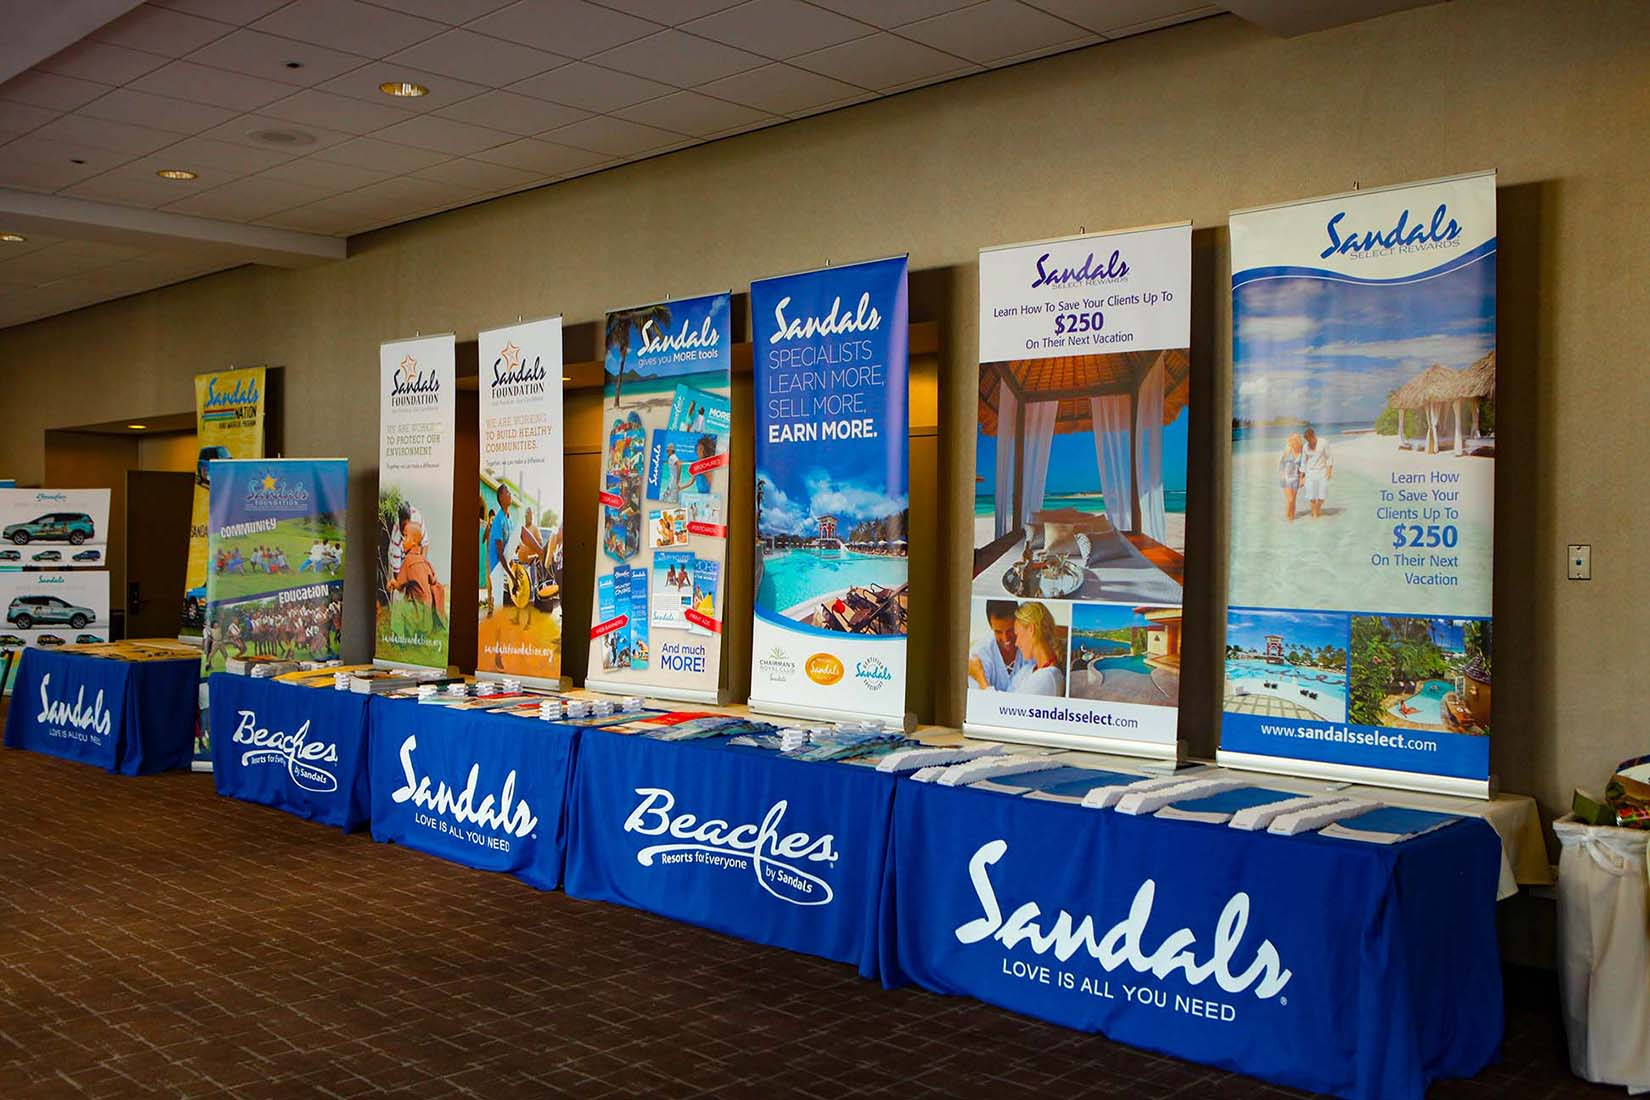 Sandals corporate event displays